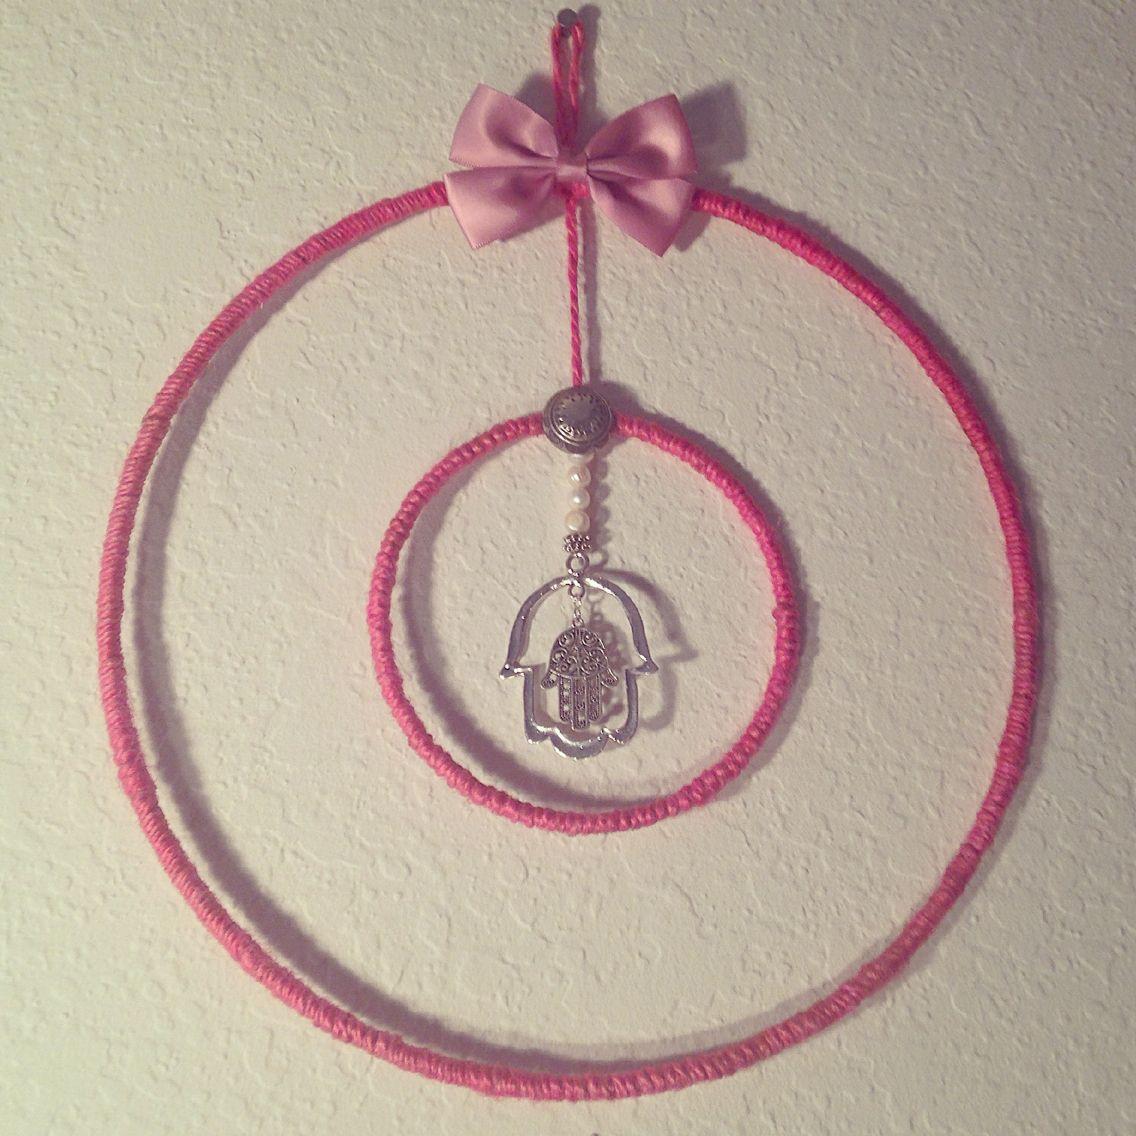 Dreamcatcher by Brass and Stone #brassandstone #dreamcatcher #hamsa #silver #bows #pink #cute #love #handmade #goodenergy #la #creative #unique #oneofakind #madeinamerica